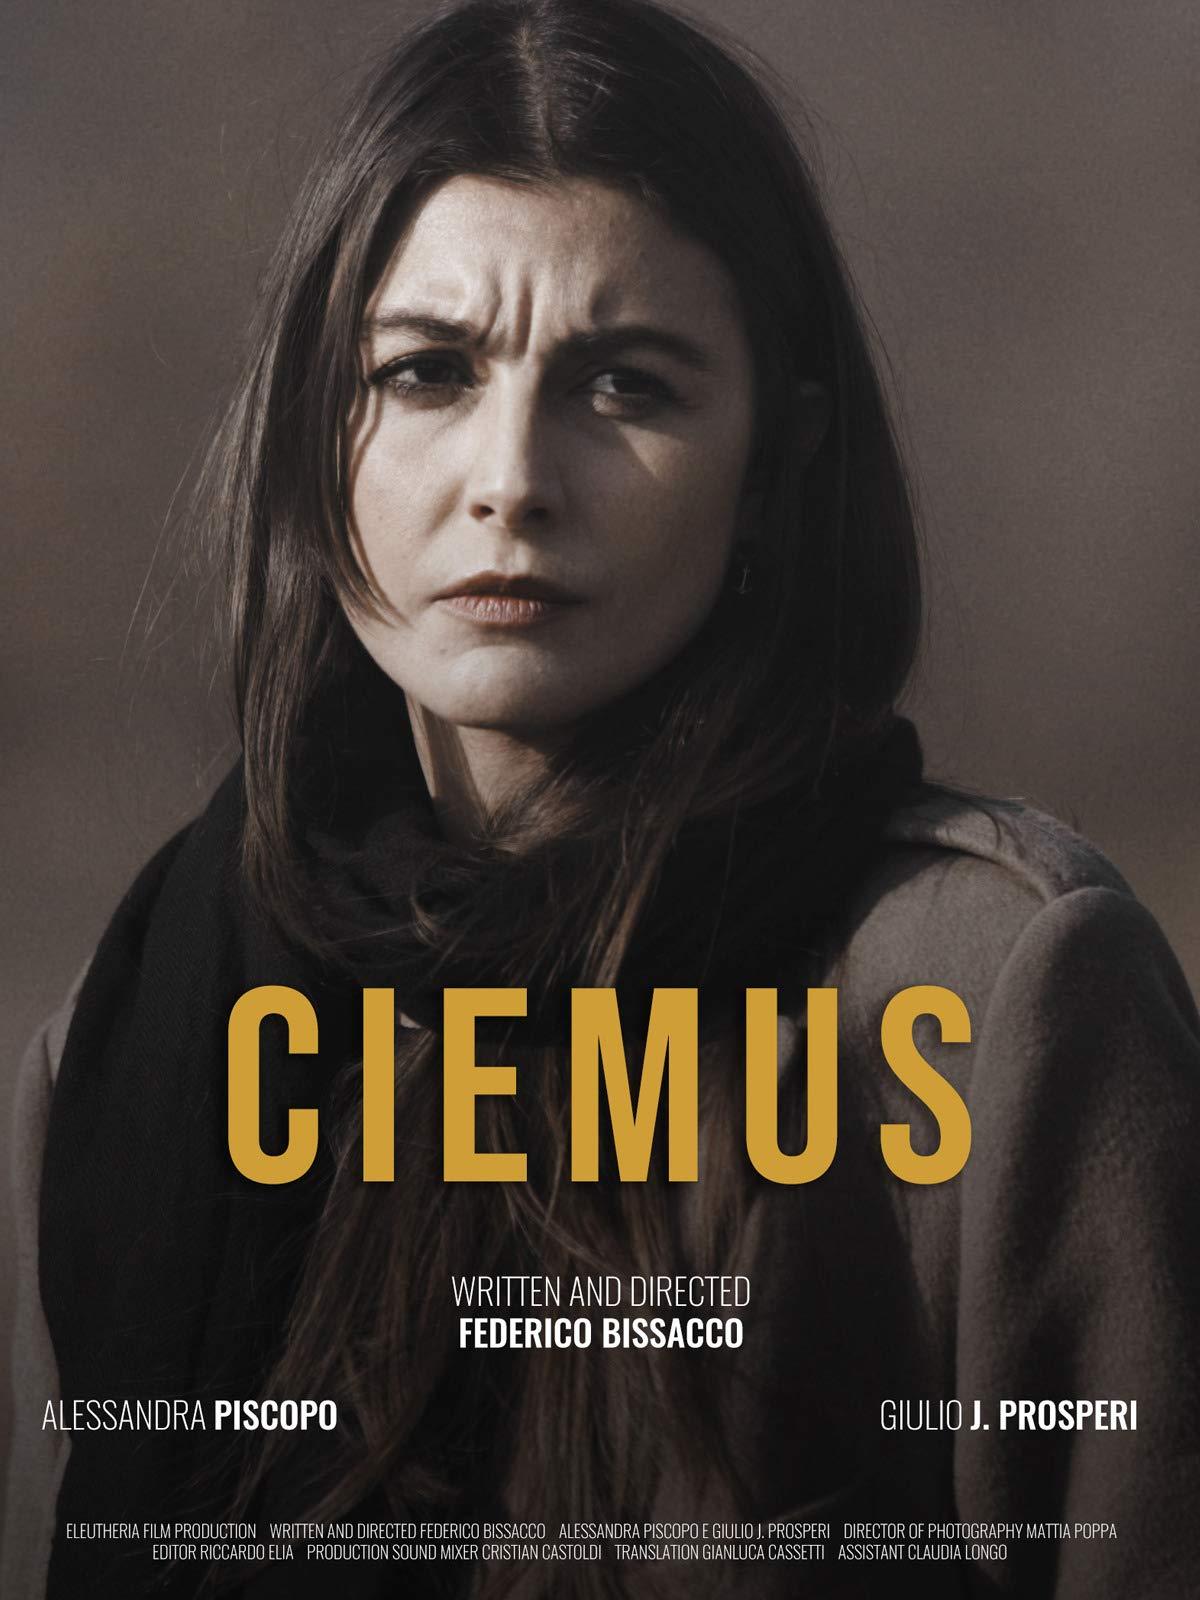 Ciemus